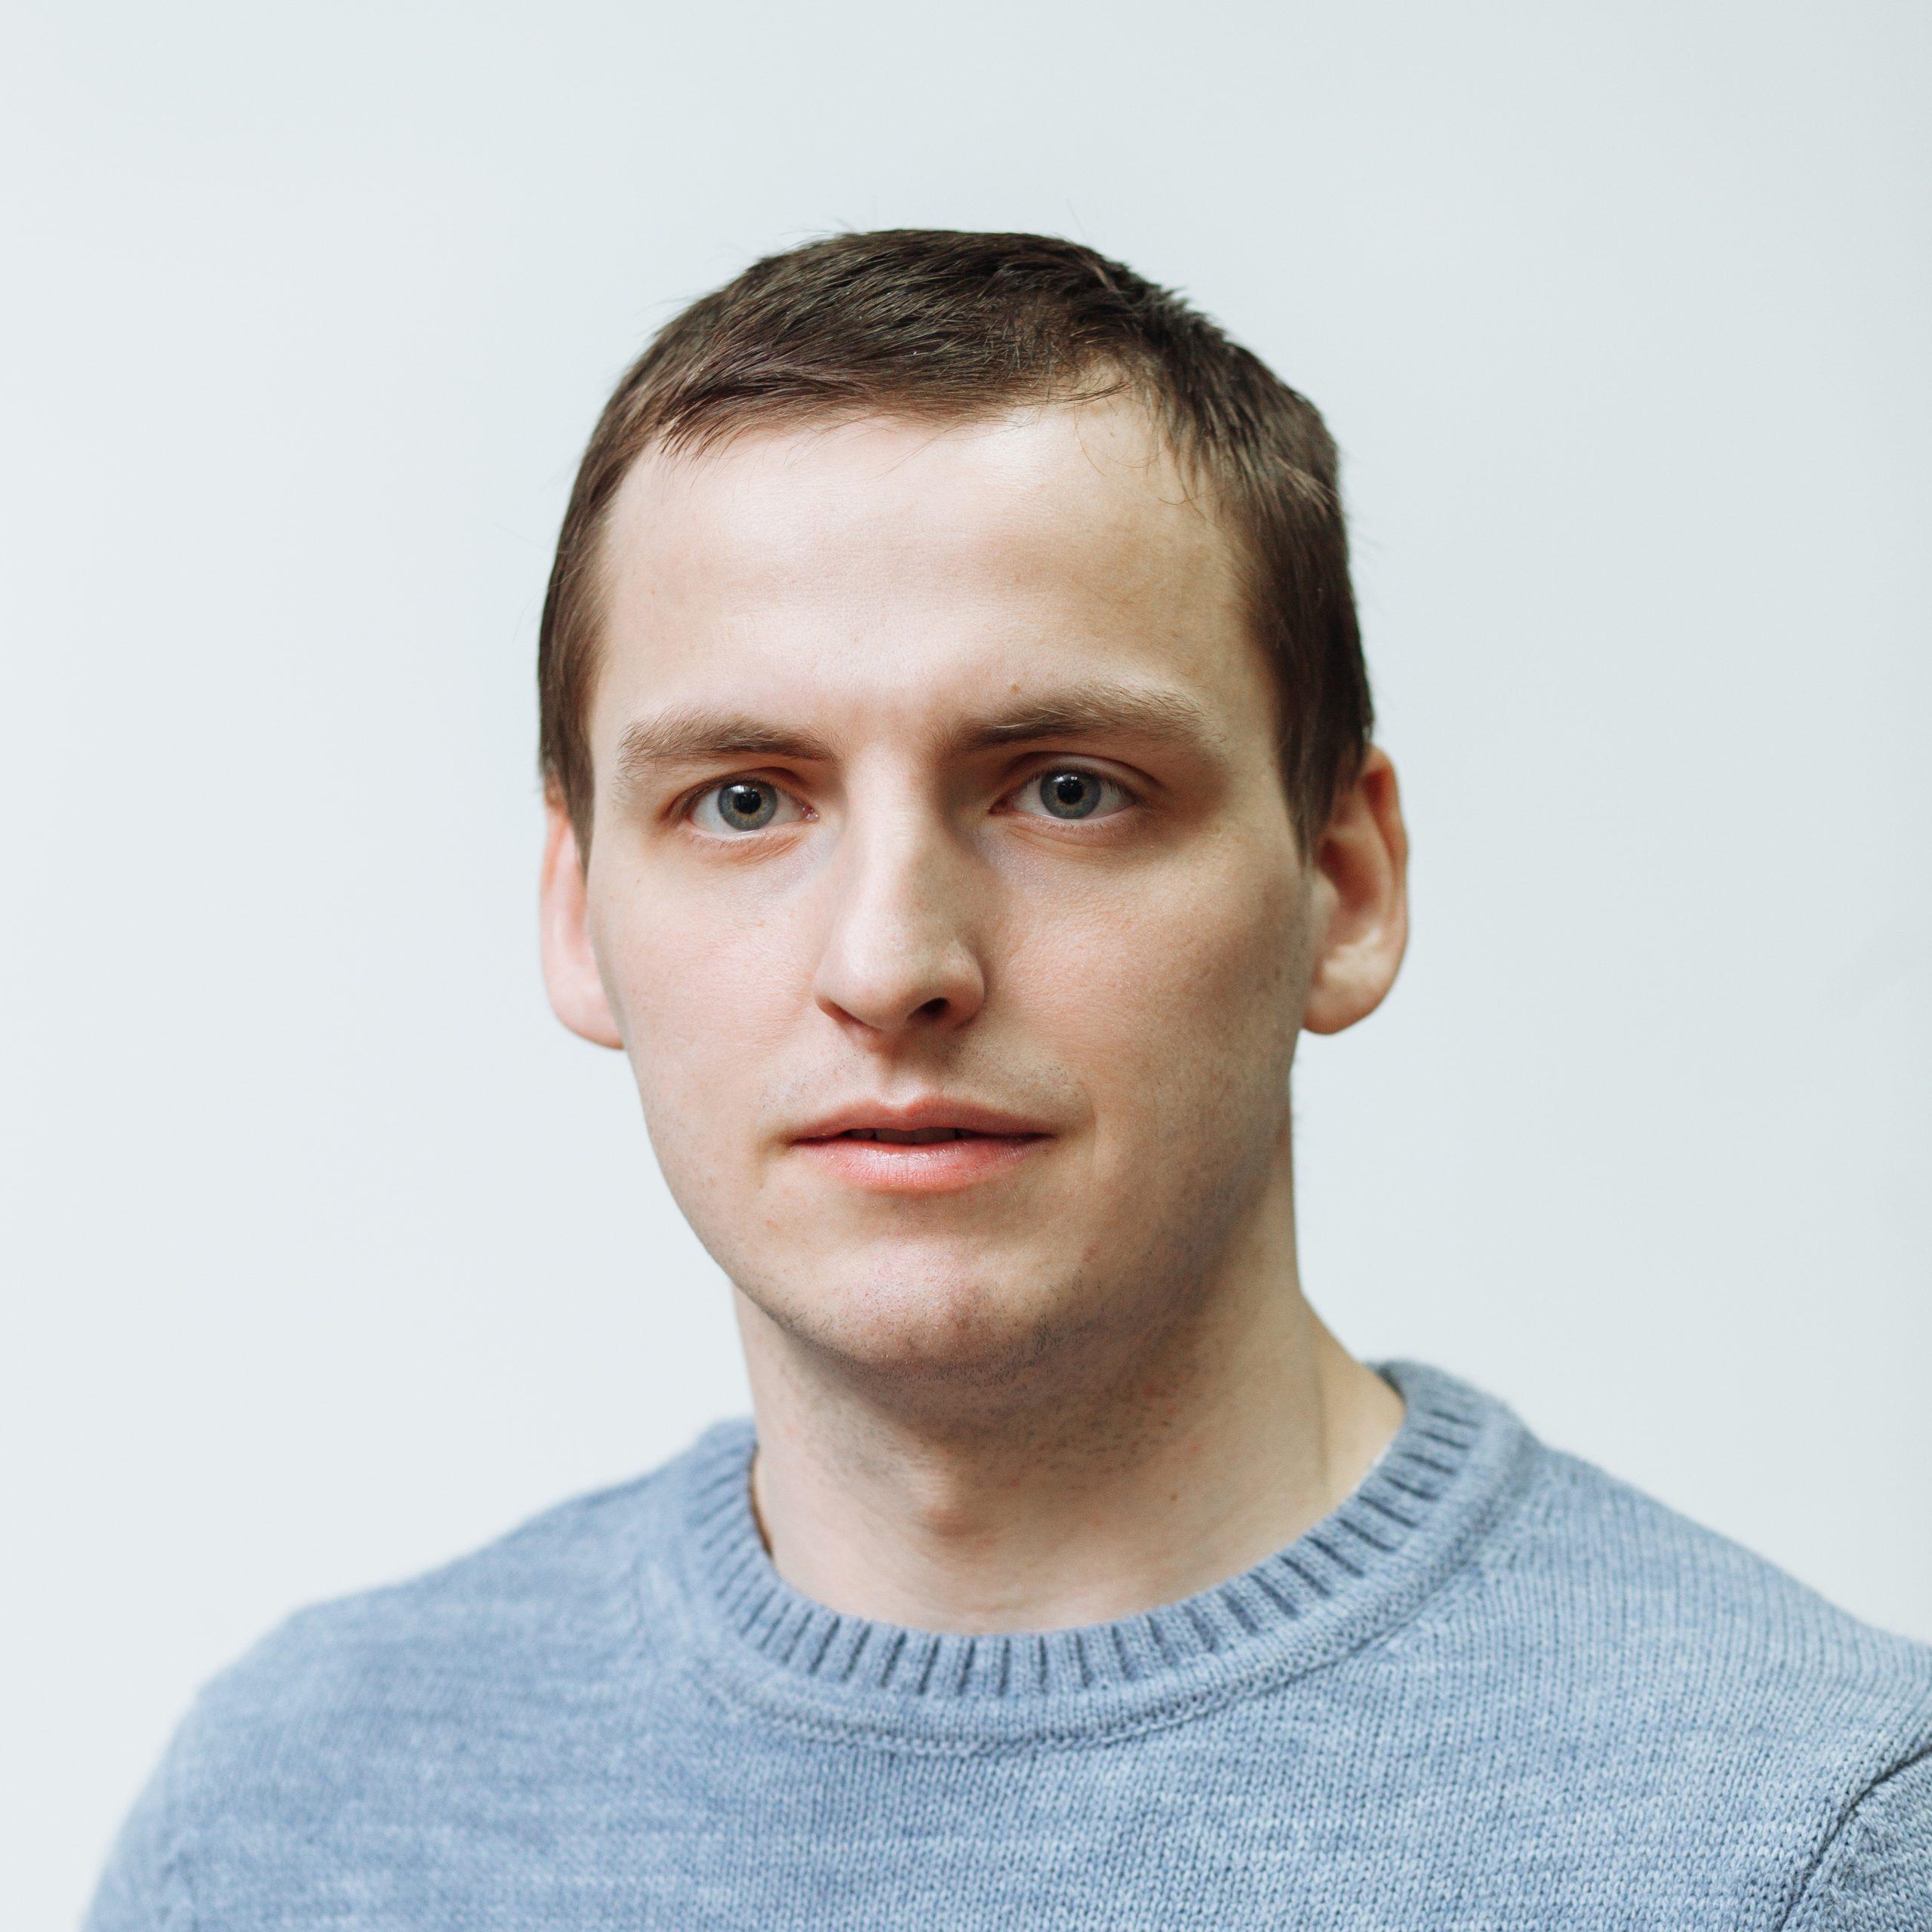 Dmitri Chernogorov